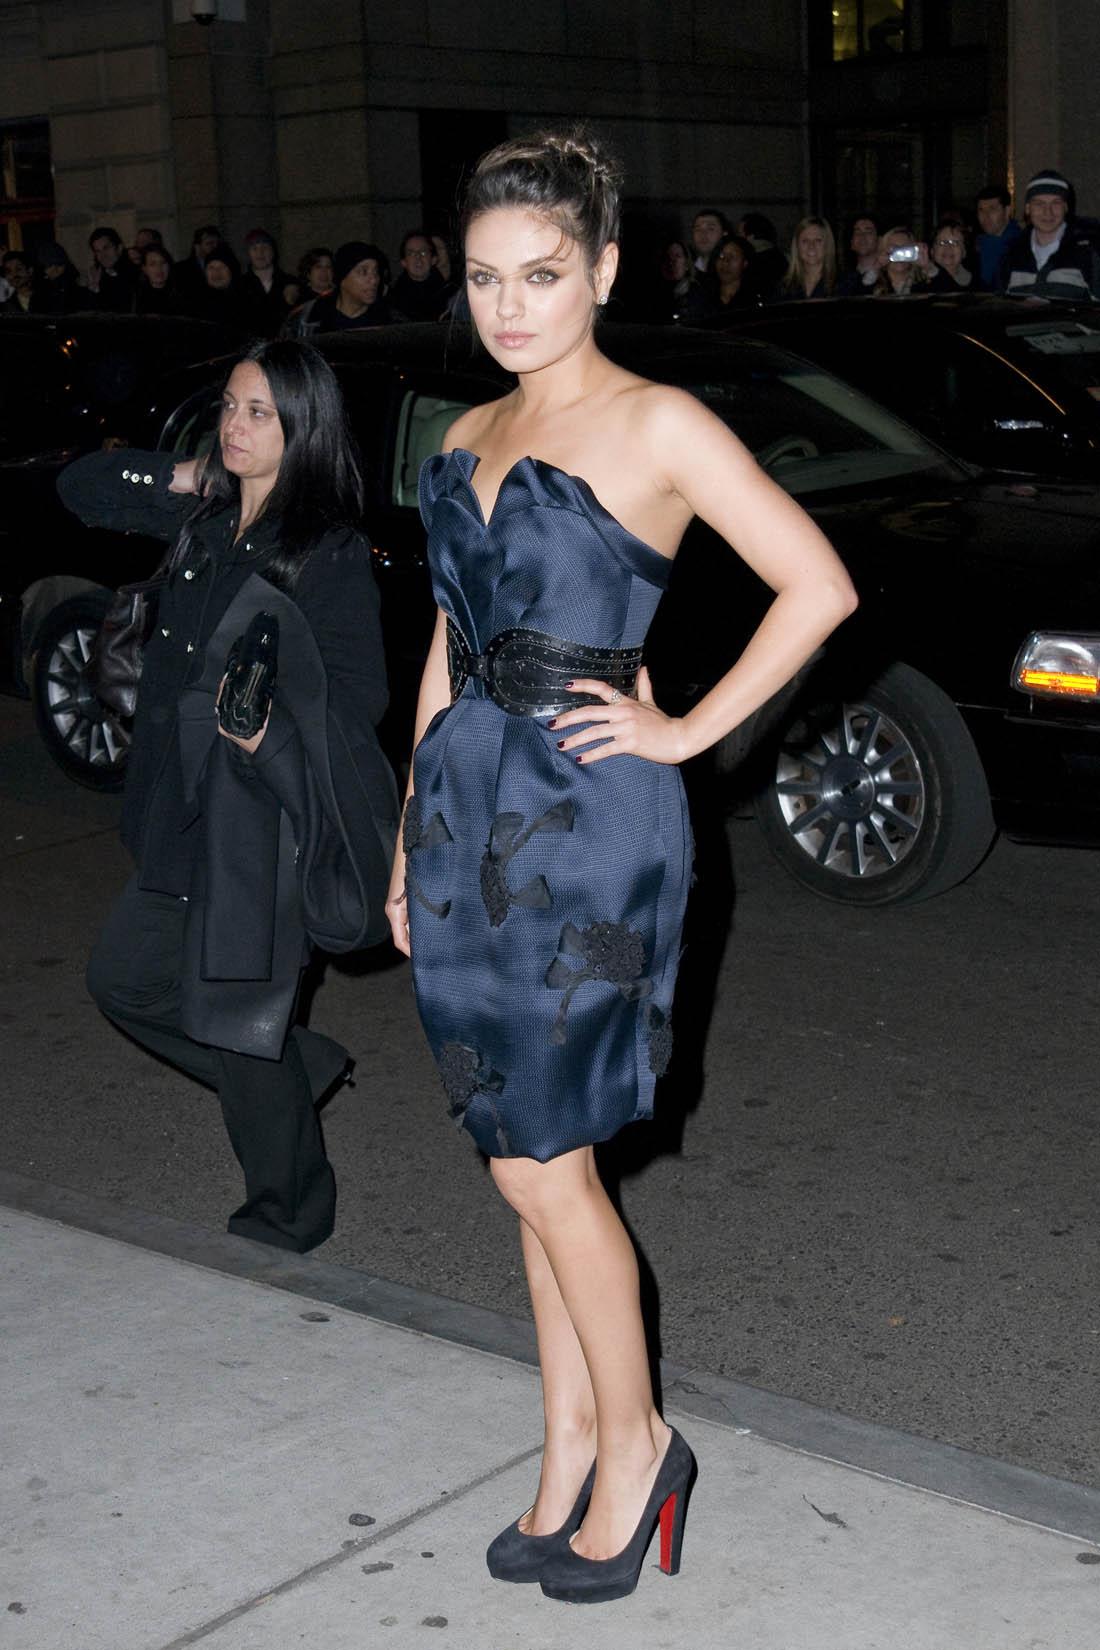 Mila Kunis In High Heels  Only In High Heels-1018